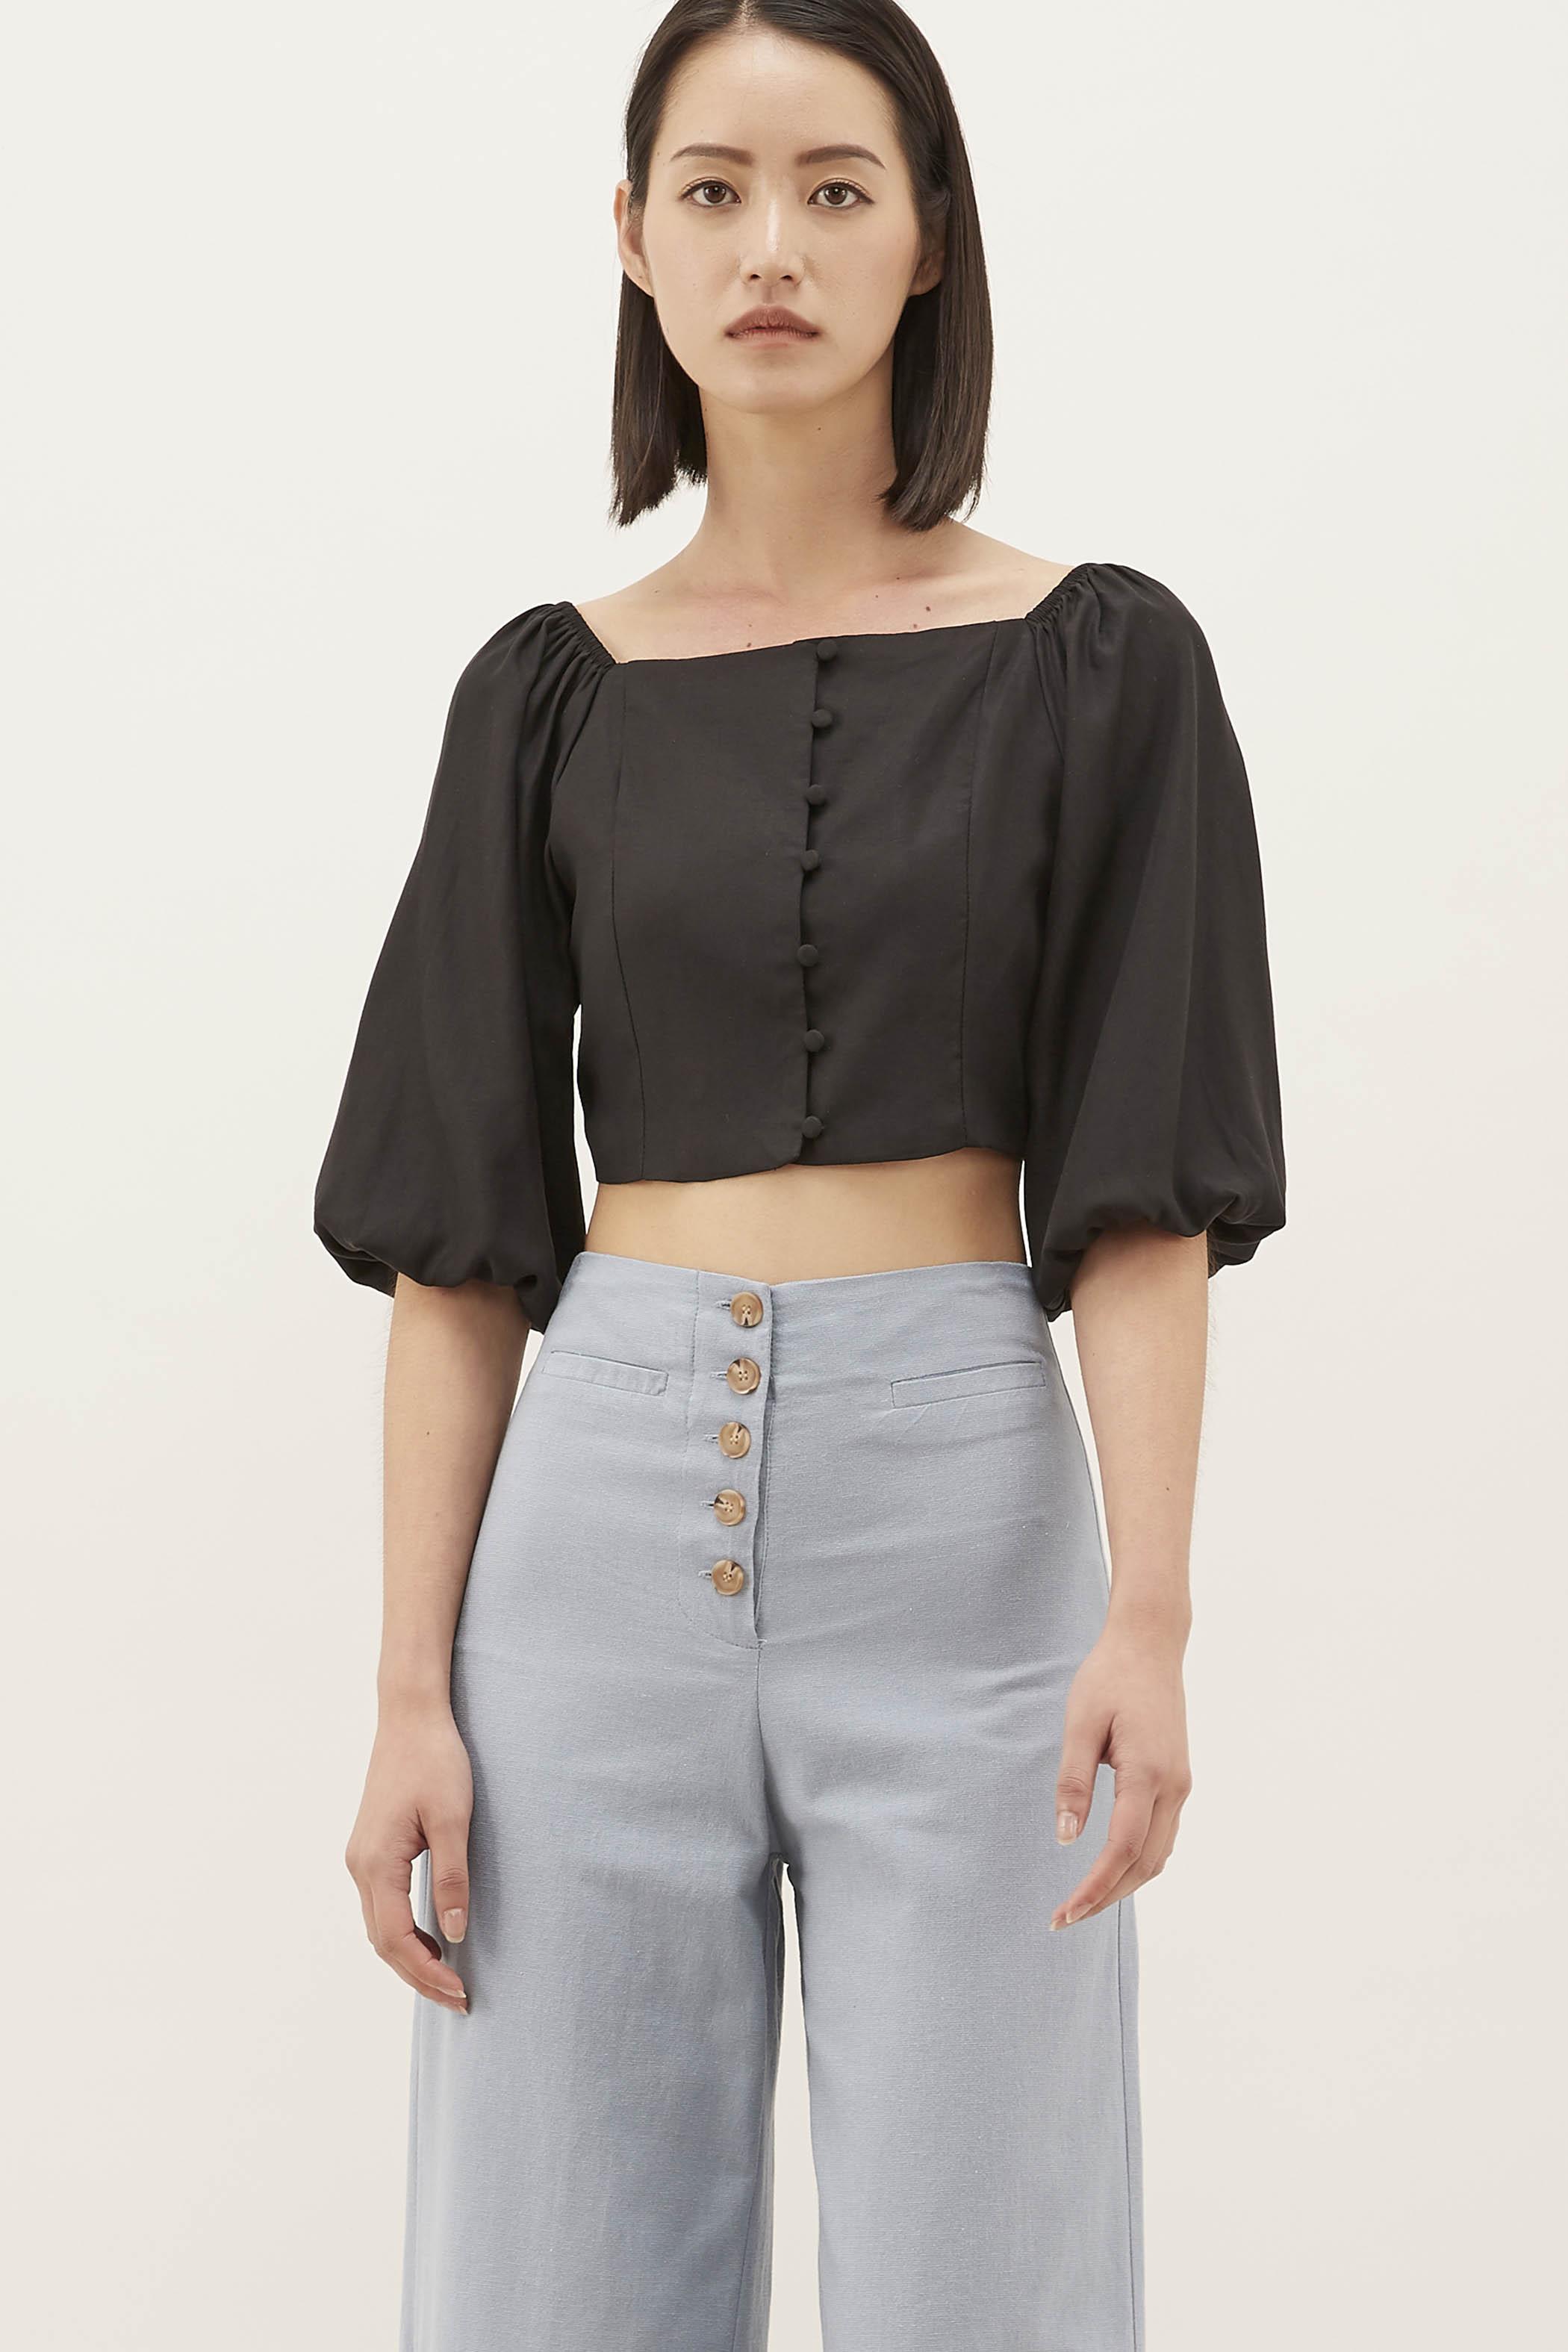 Elysa Square-neck Crop Top